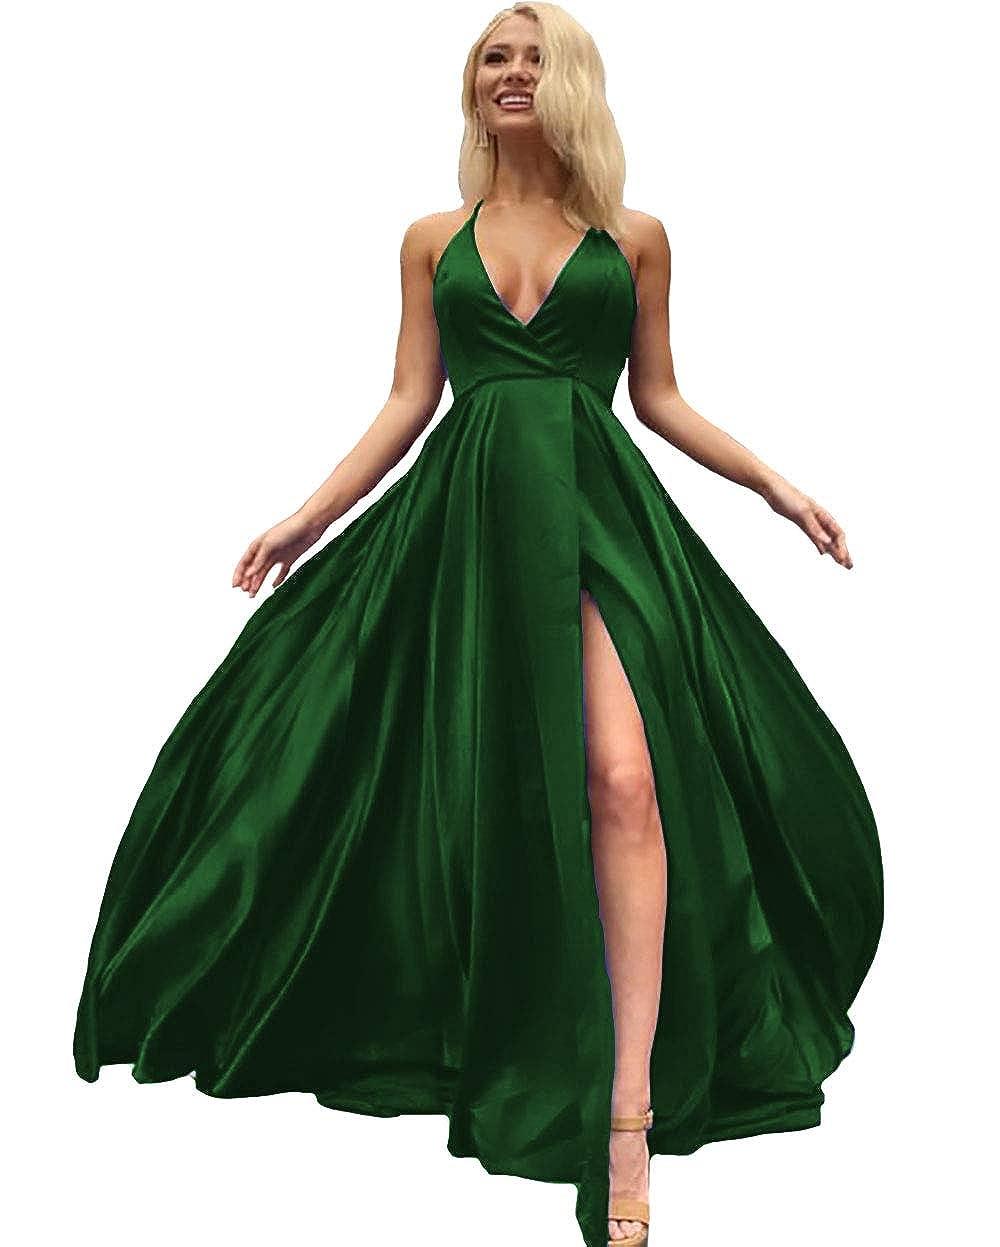 Dark Green IVYPRECIOUS V Neck Side Split Prom Dresses A Line Long Evening Gowns for Women